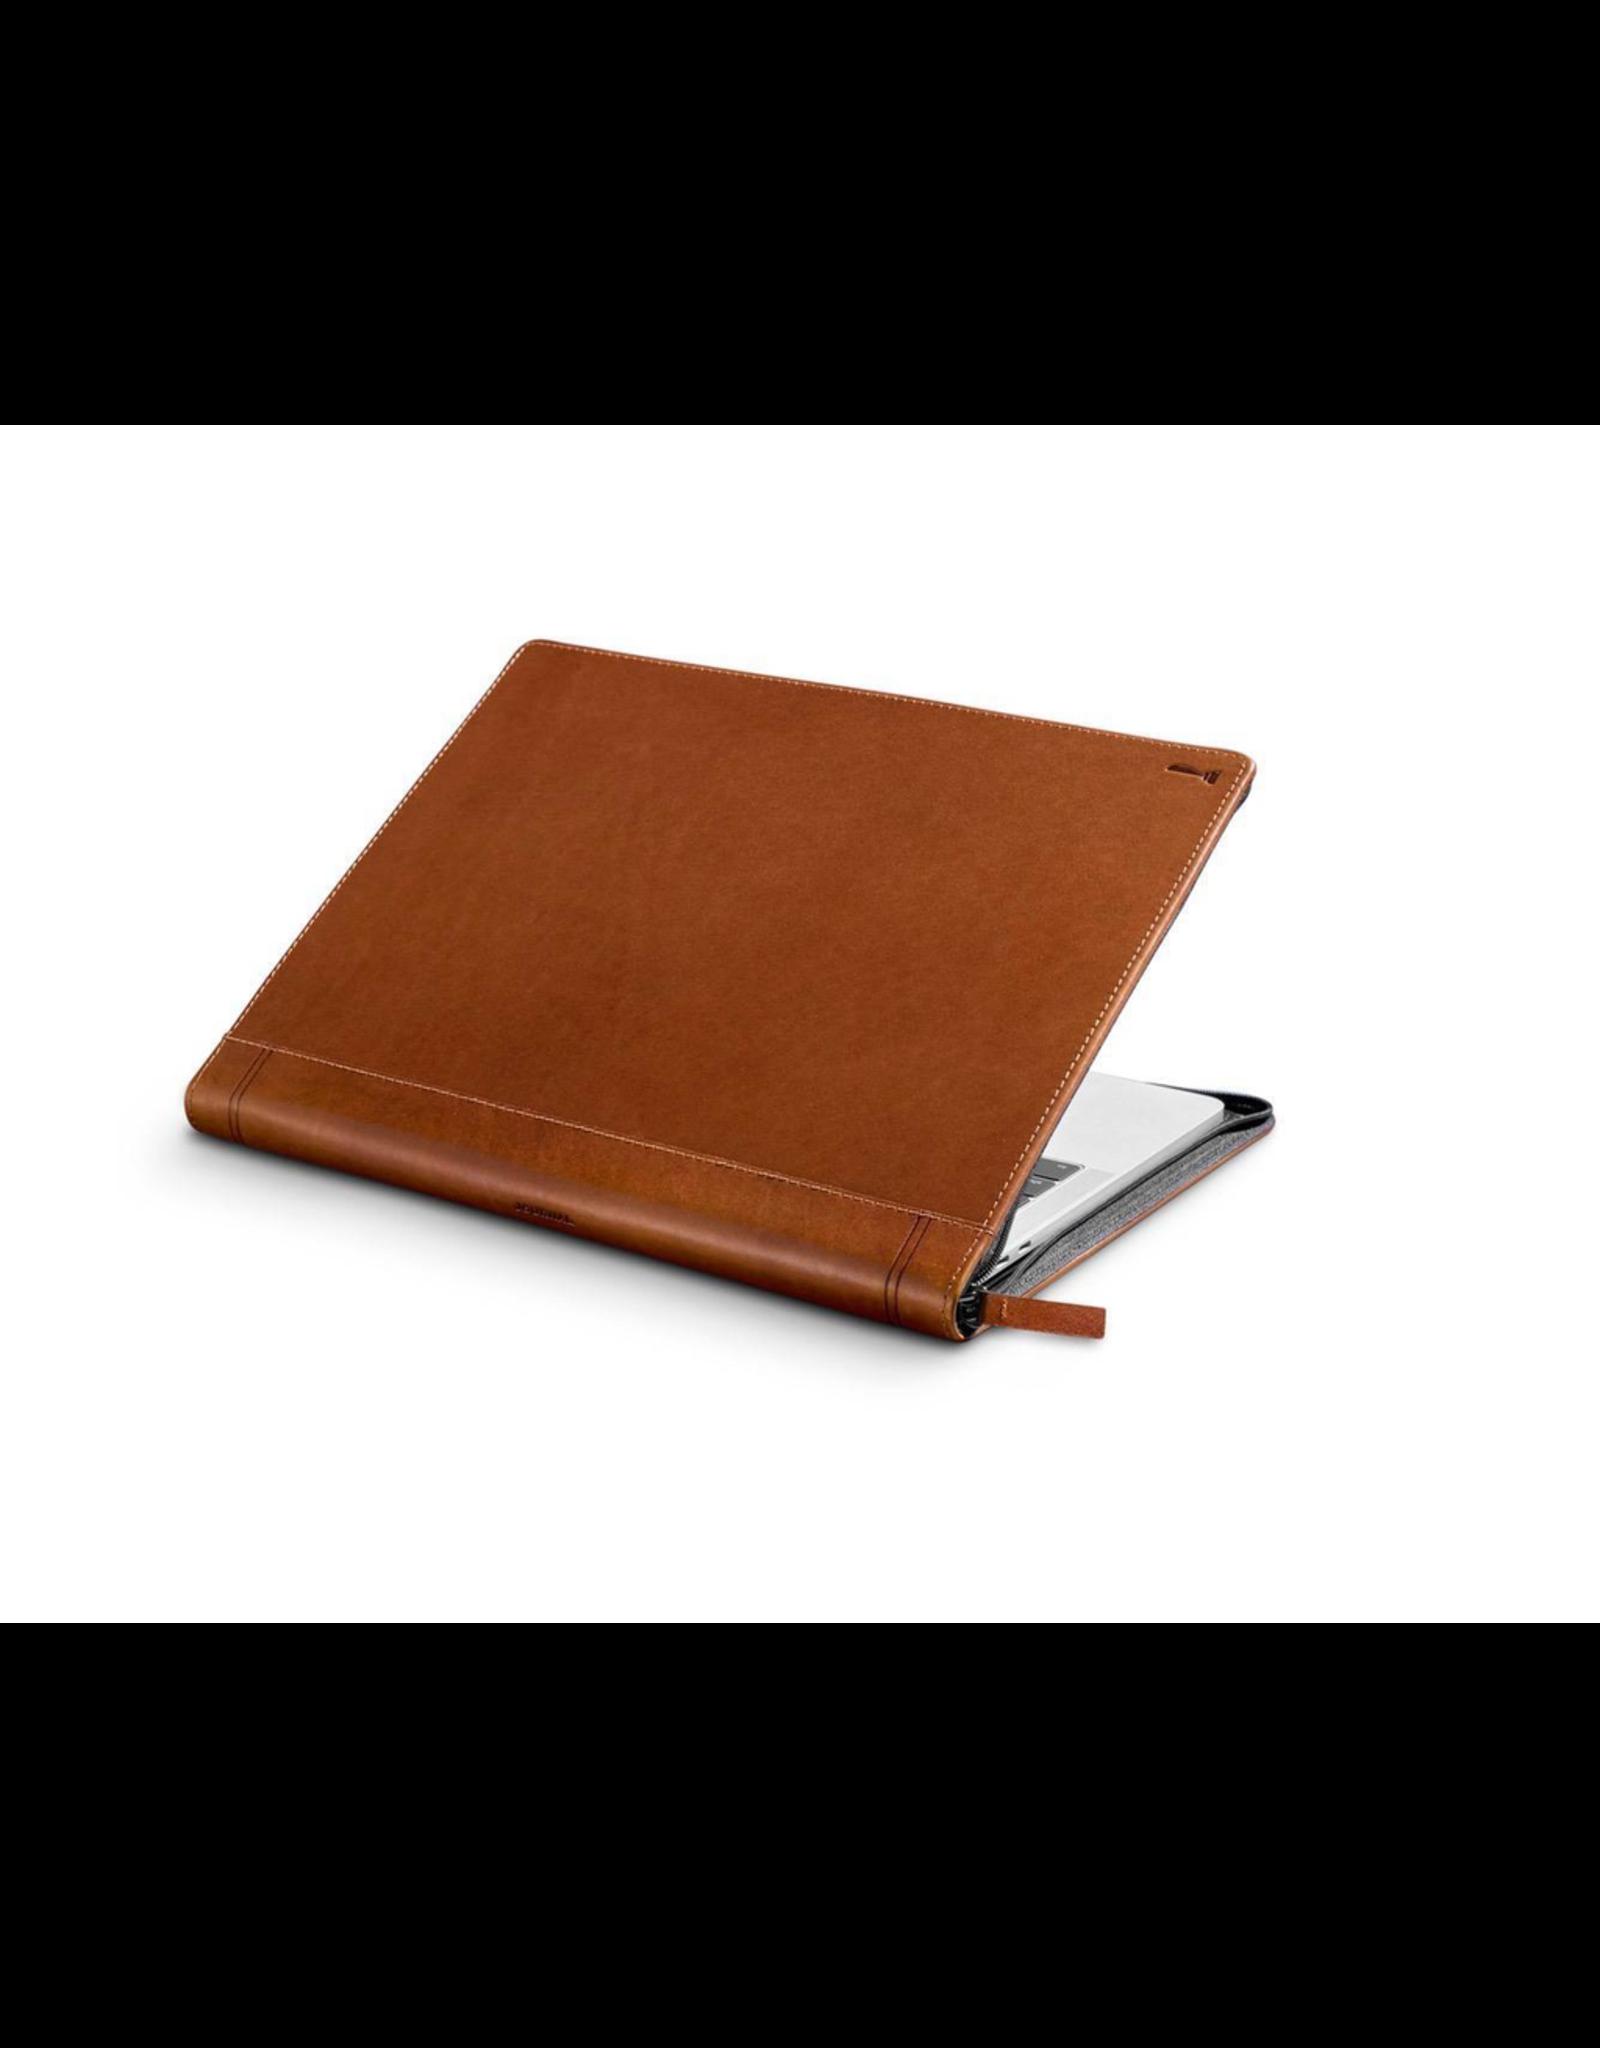 "Twelve South Twelve South Journal for MacBook Pro 13"" (USB-C / Thunderbolt 3) - Cognac"